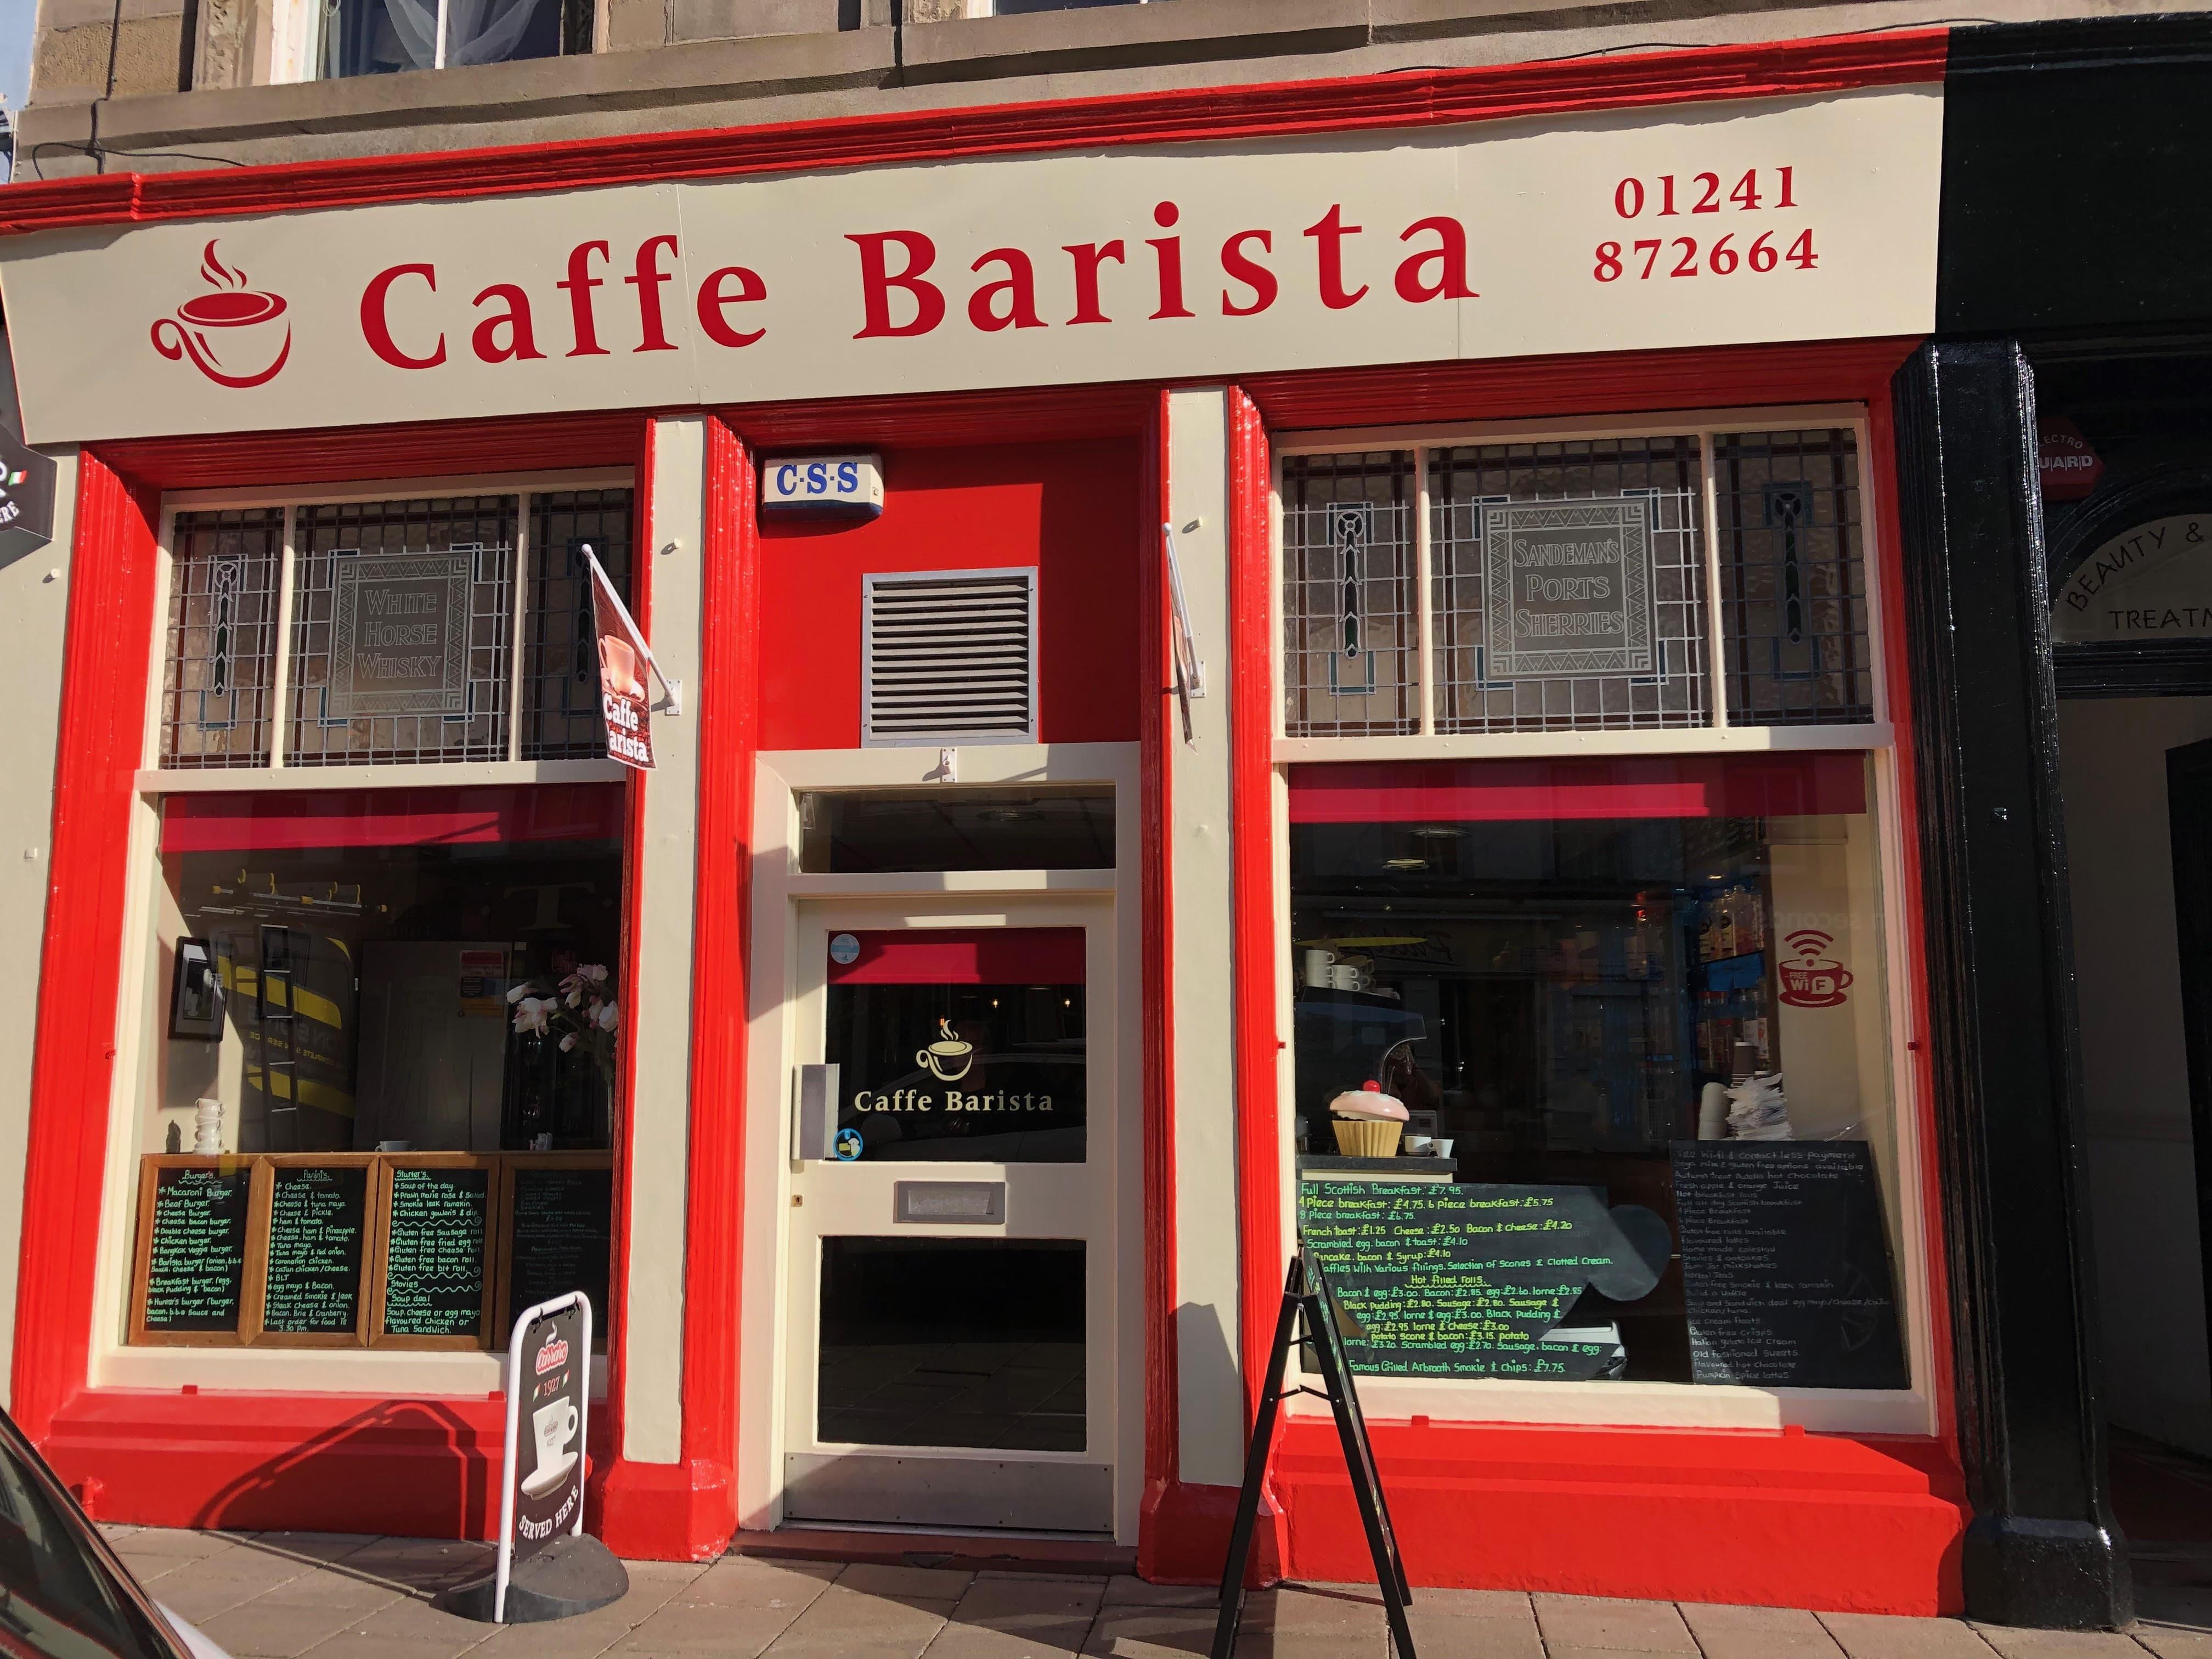 http://caffe-barista.co.uk/wp-content/uploads/2019/07/CaffeFront-min.jpg